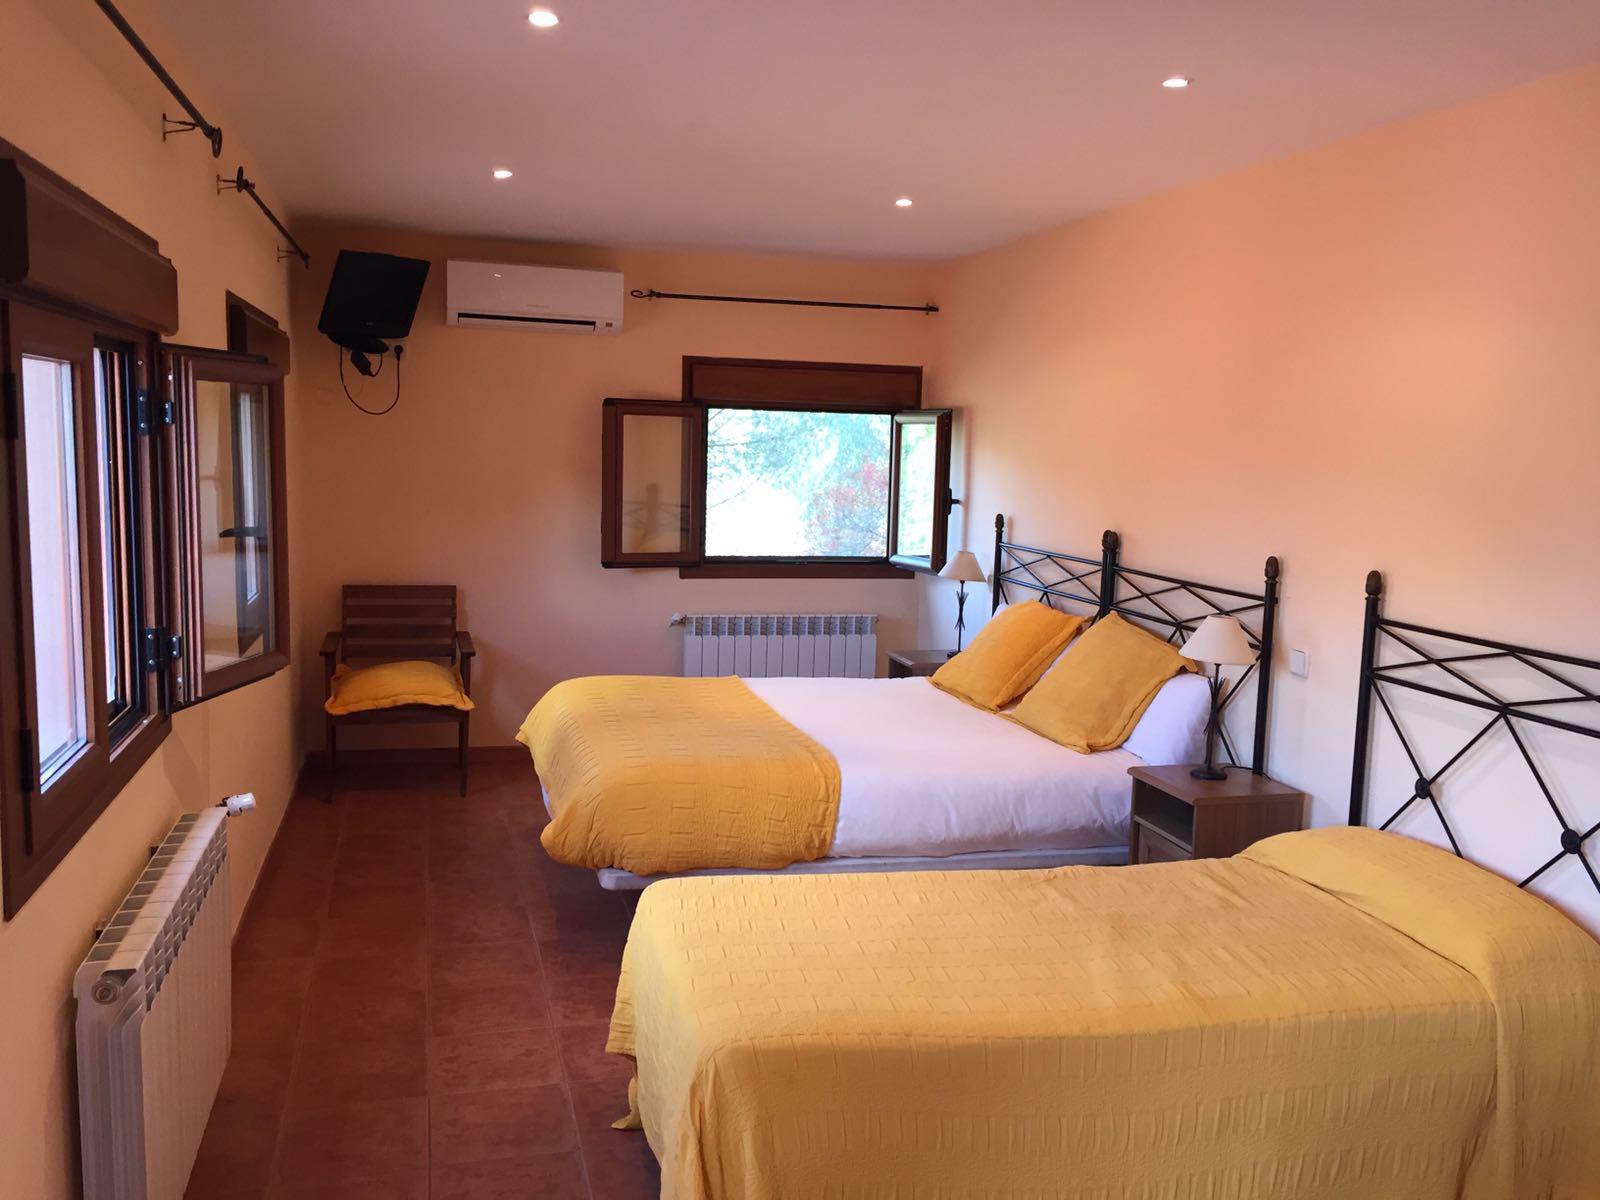 habitacion triple, cama de matrimonio grande, cama individual